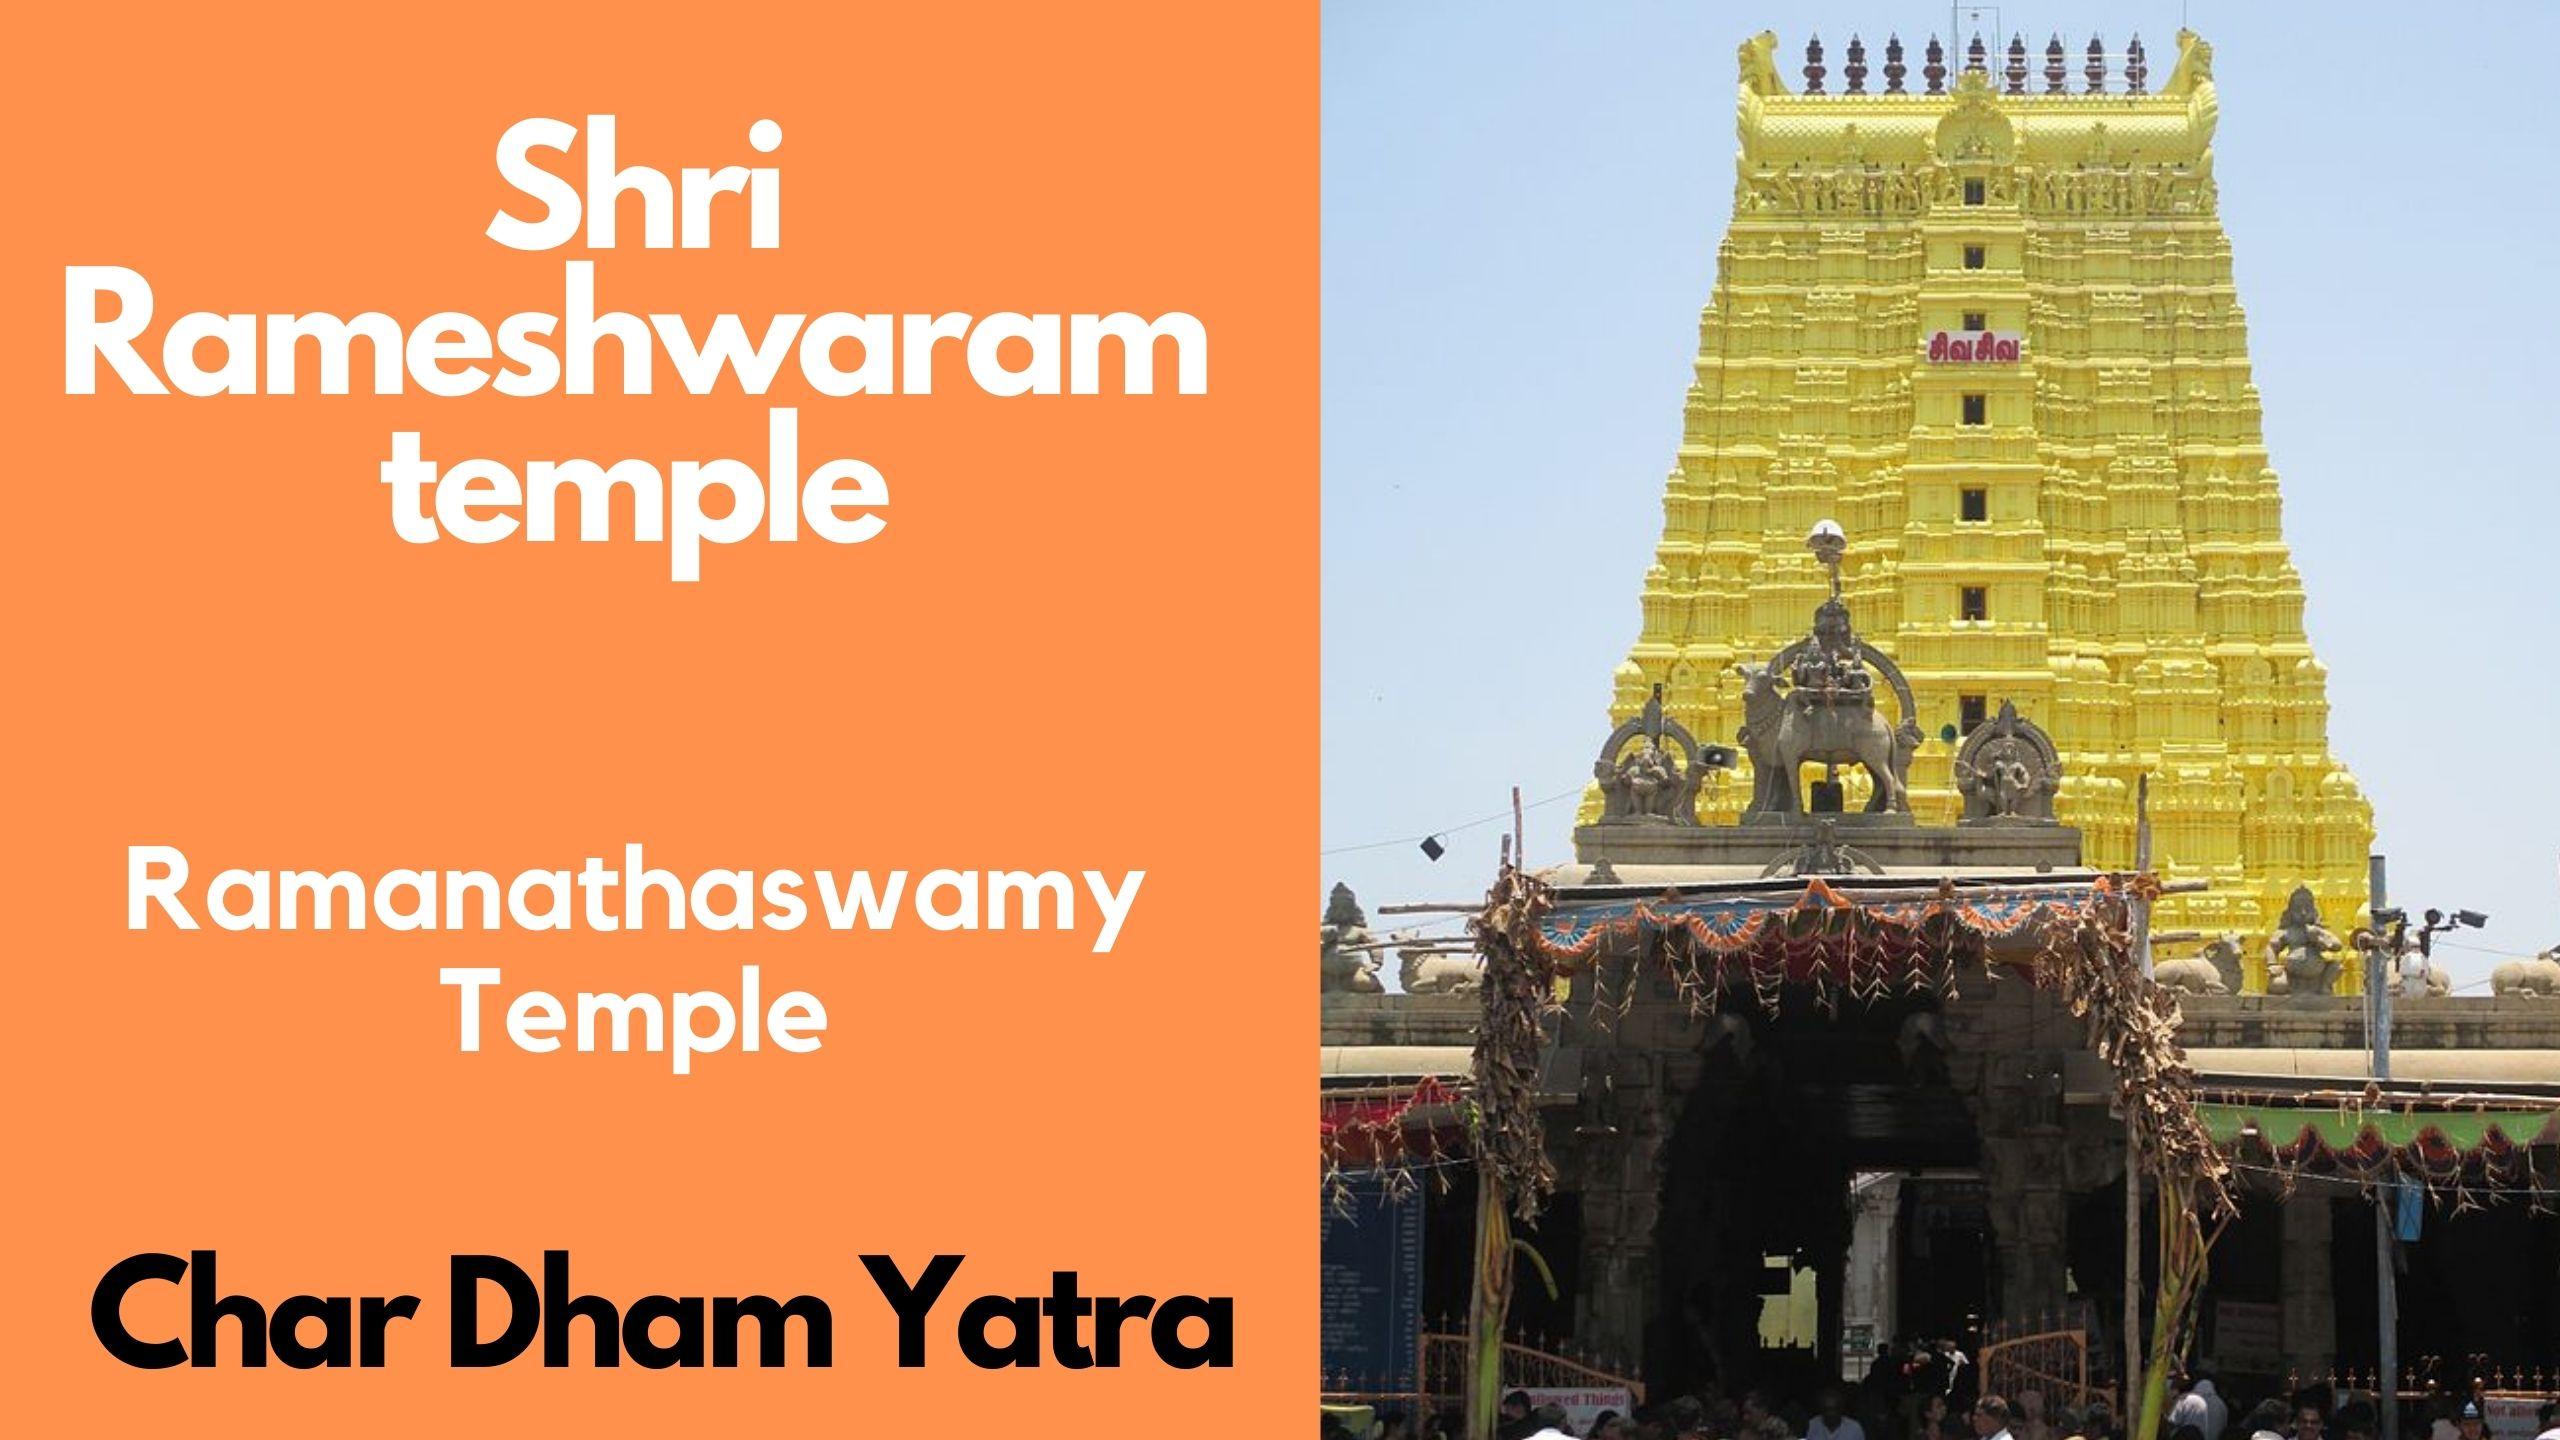 Shri Rameshwaram temple